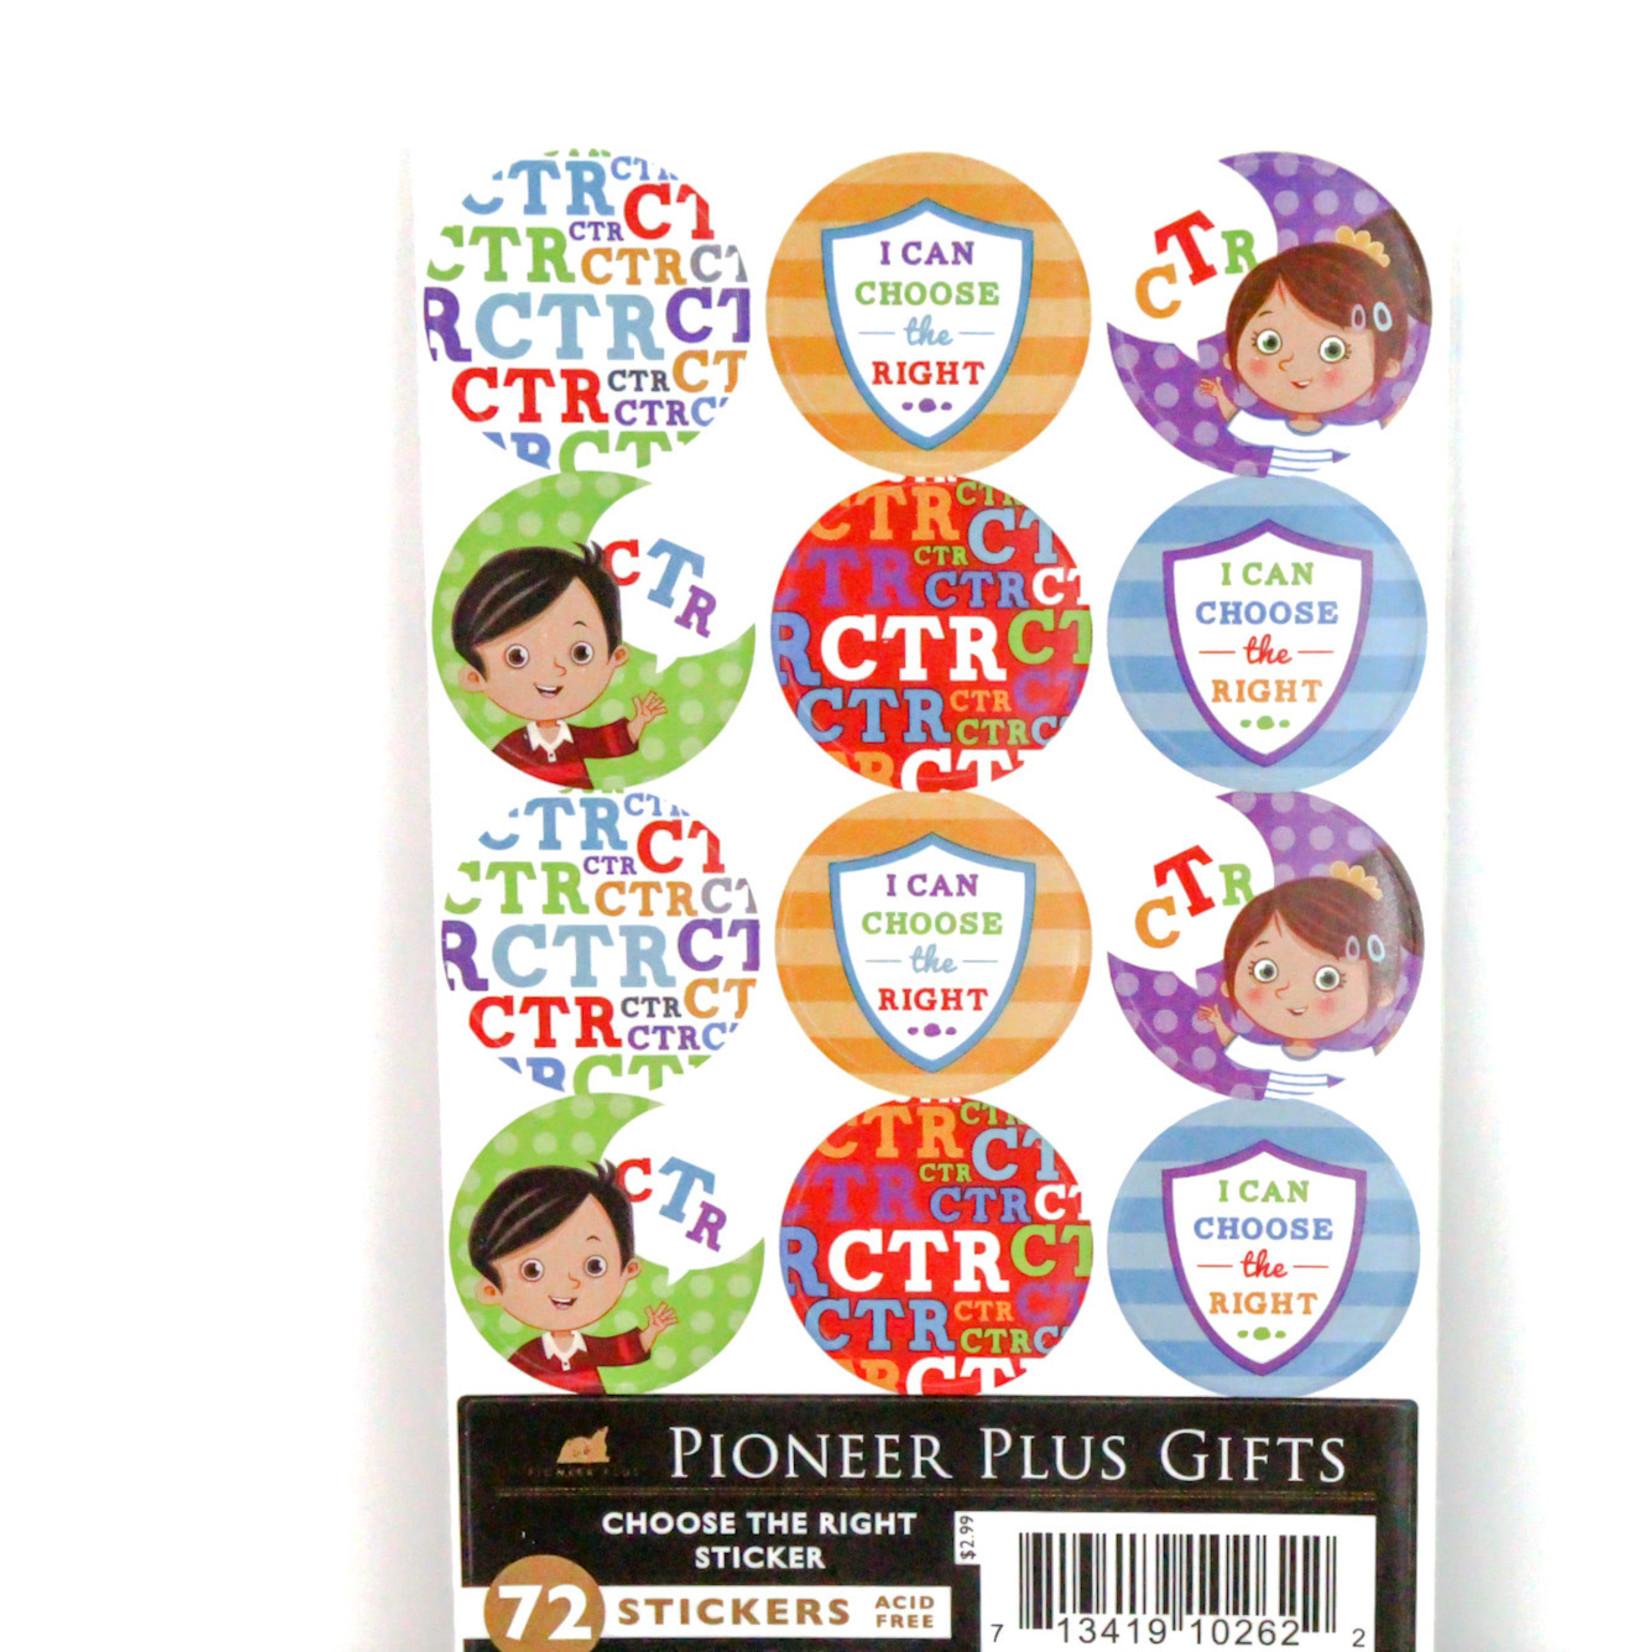 STICKERS - CTR